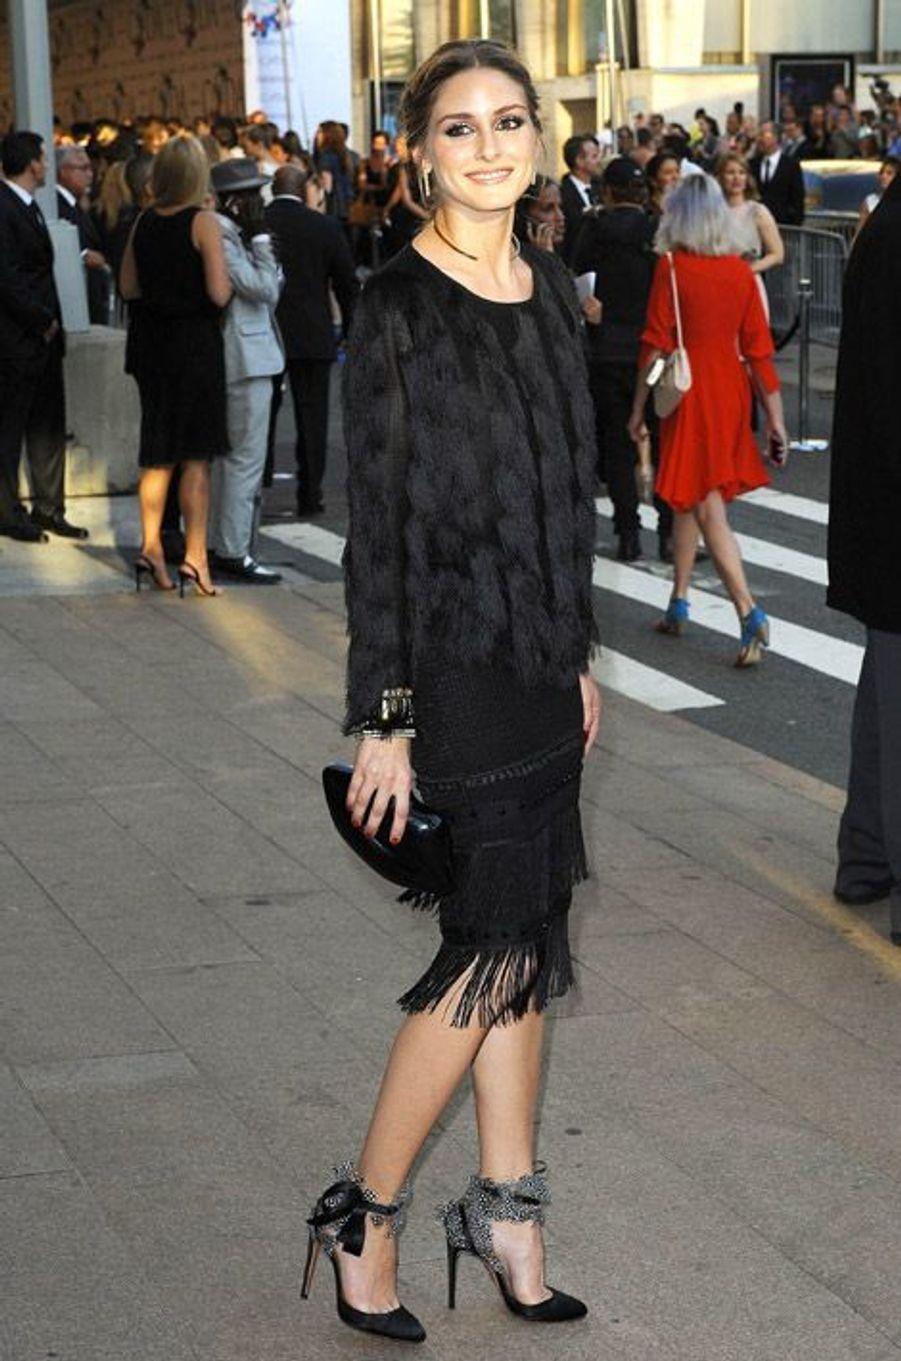 La styliste Olivia Palermo en Aquazurra pendant la Fashion Week de New York, le 2 juin 2014